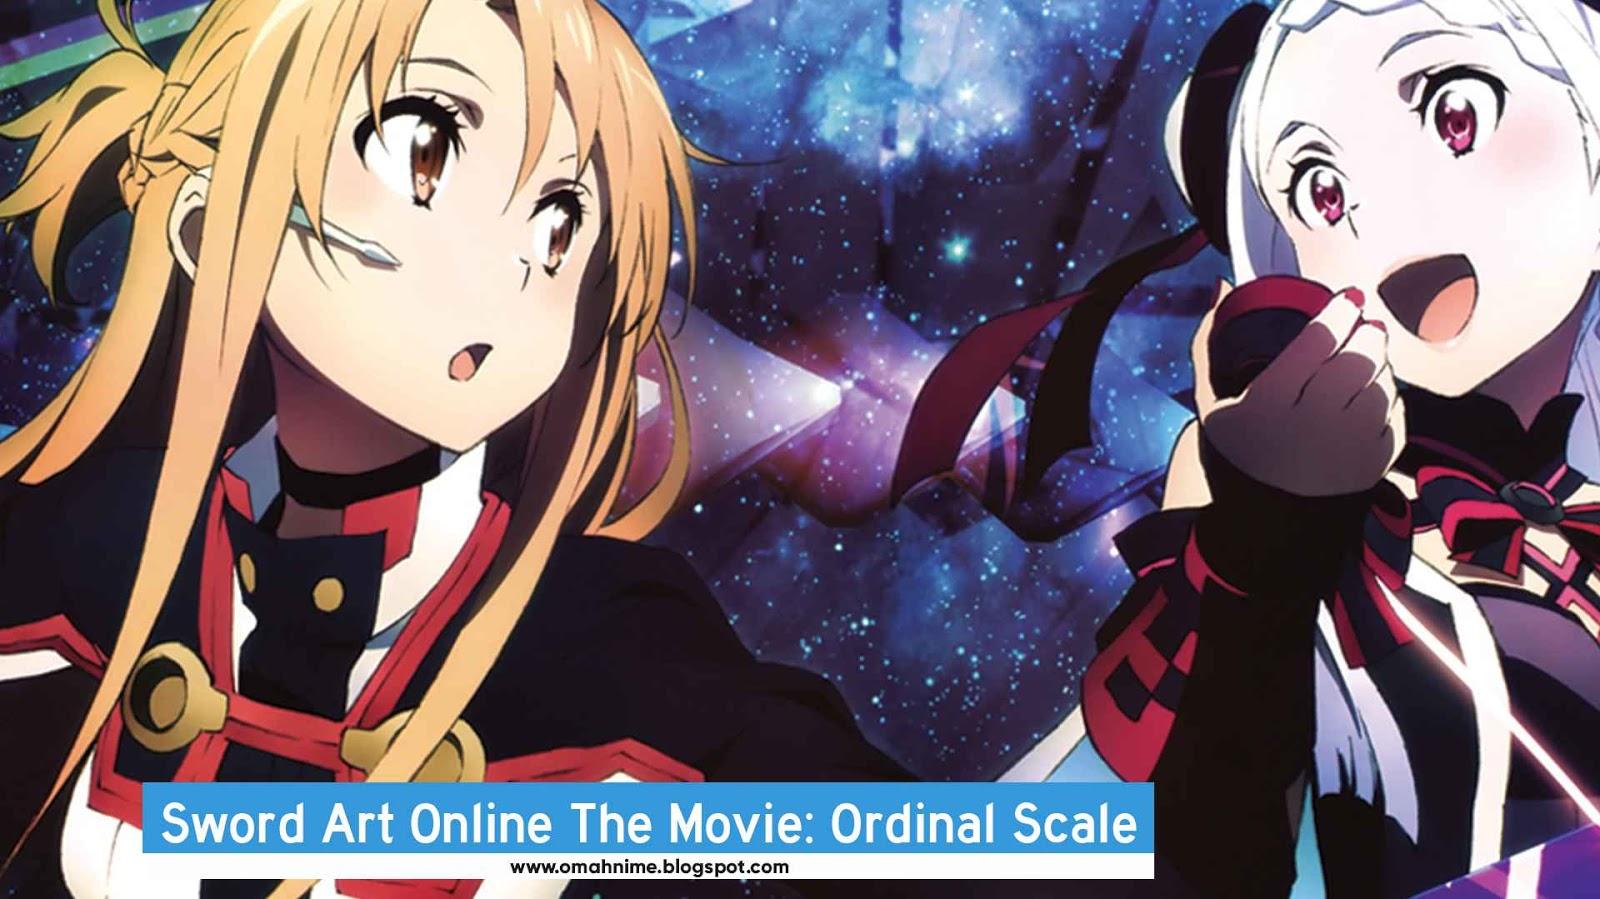 Sword art online movie ordinal scale bd subtitle indonesia